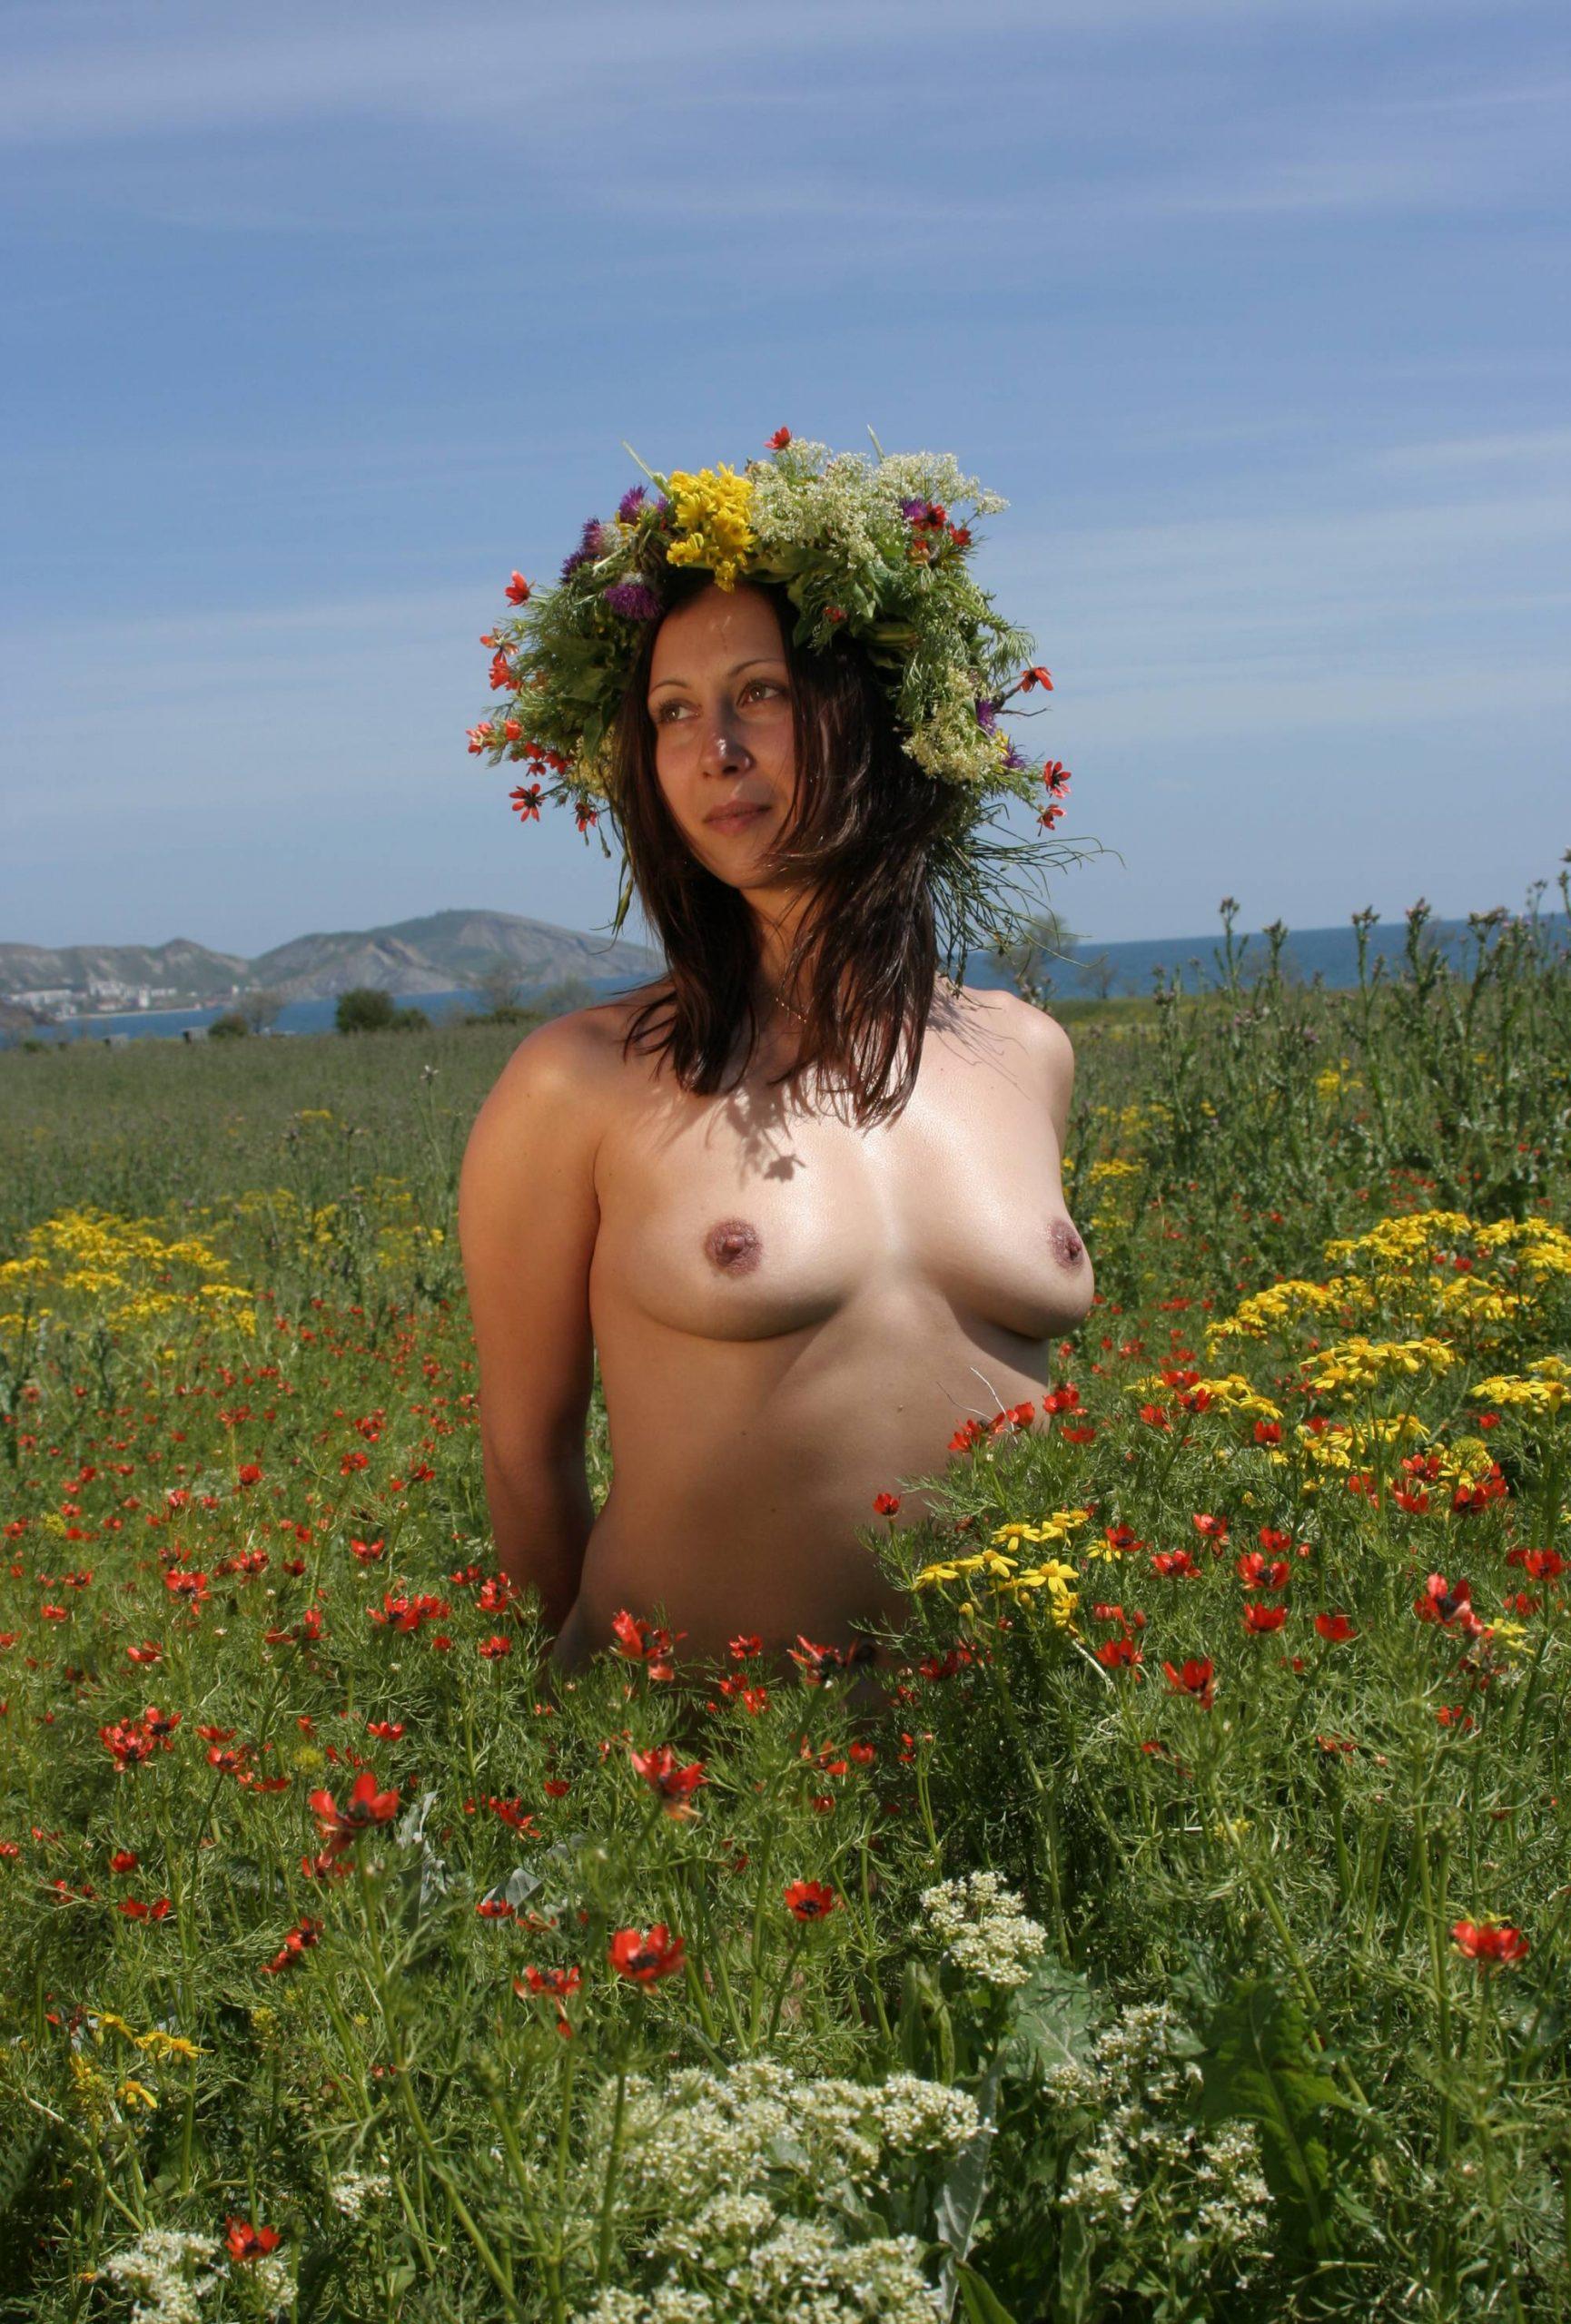 Purenudism Gallery-Naturist Fields of Dreams - 4